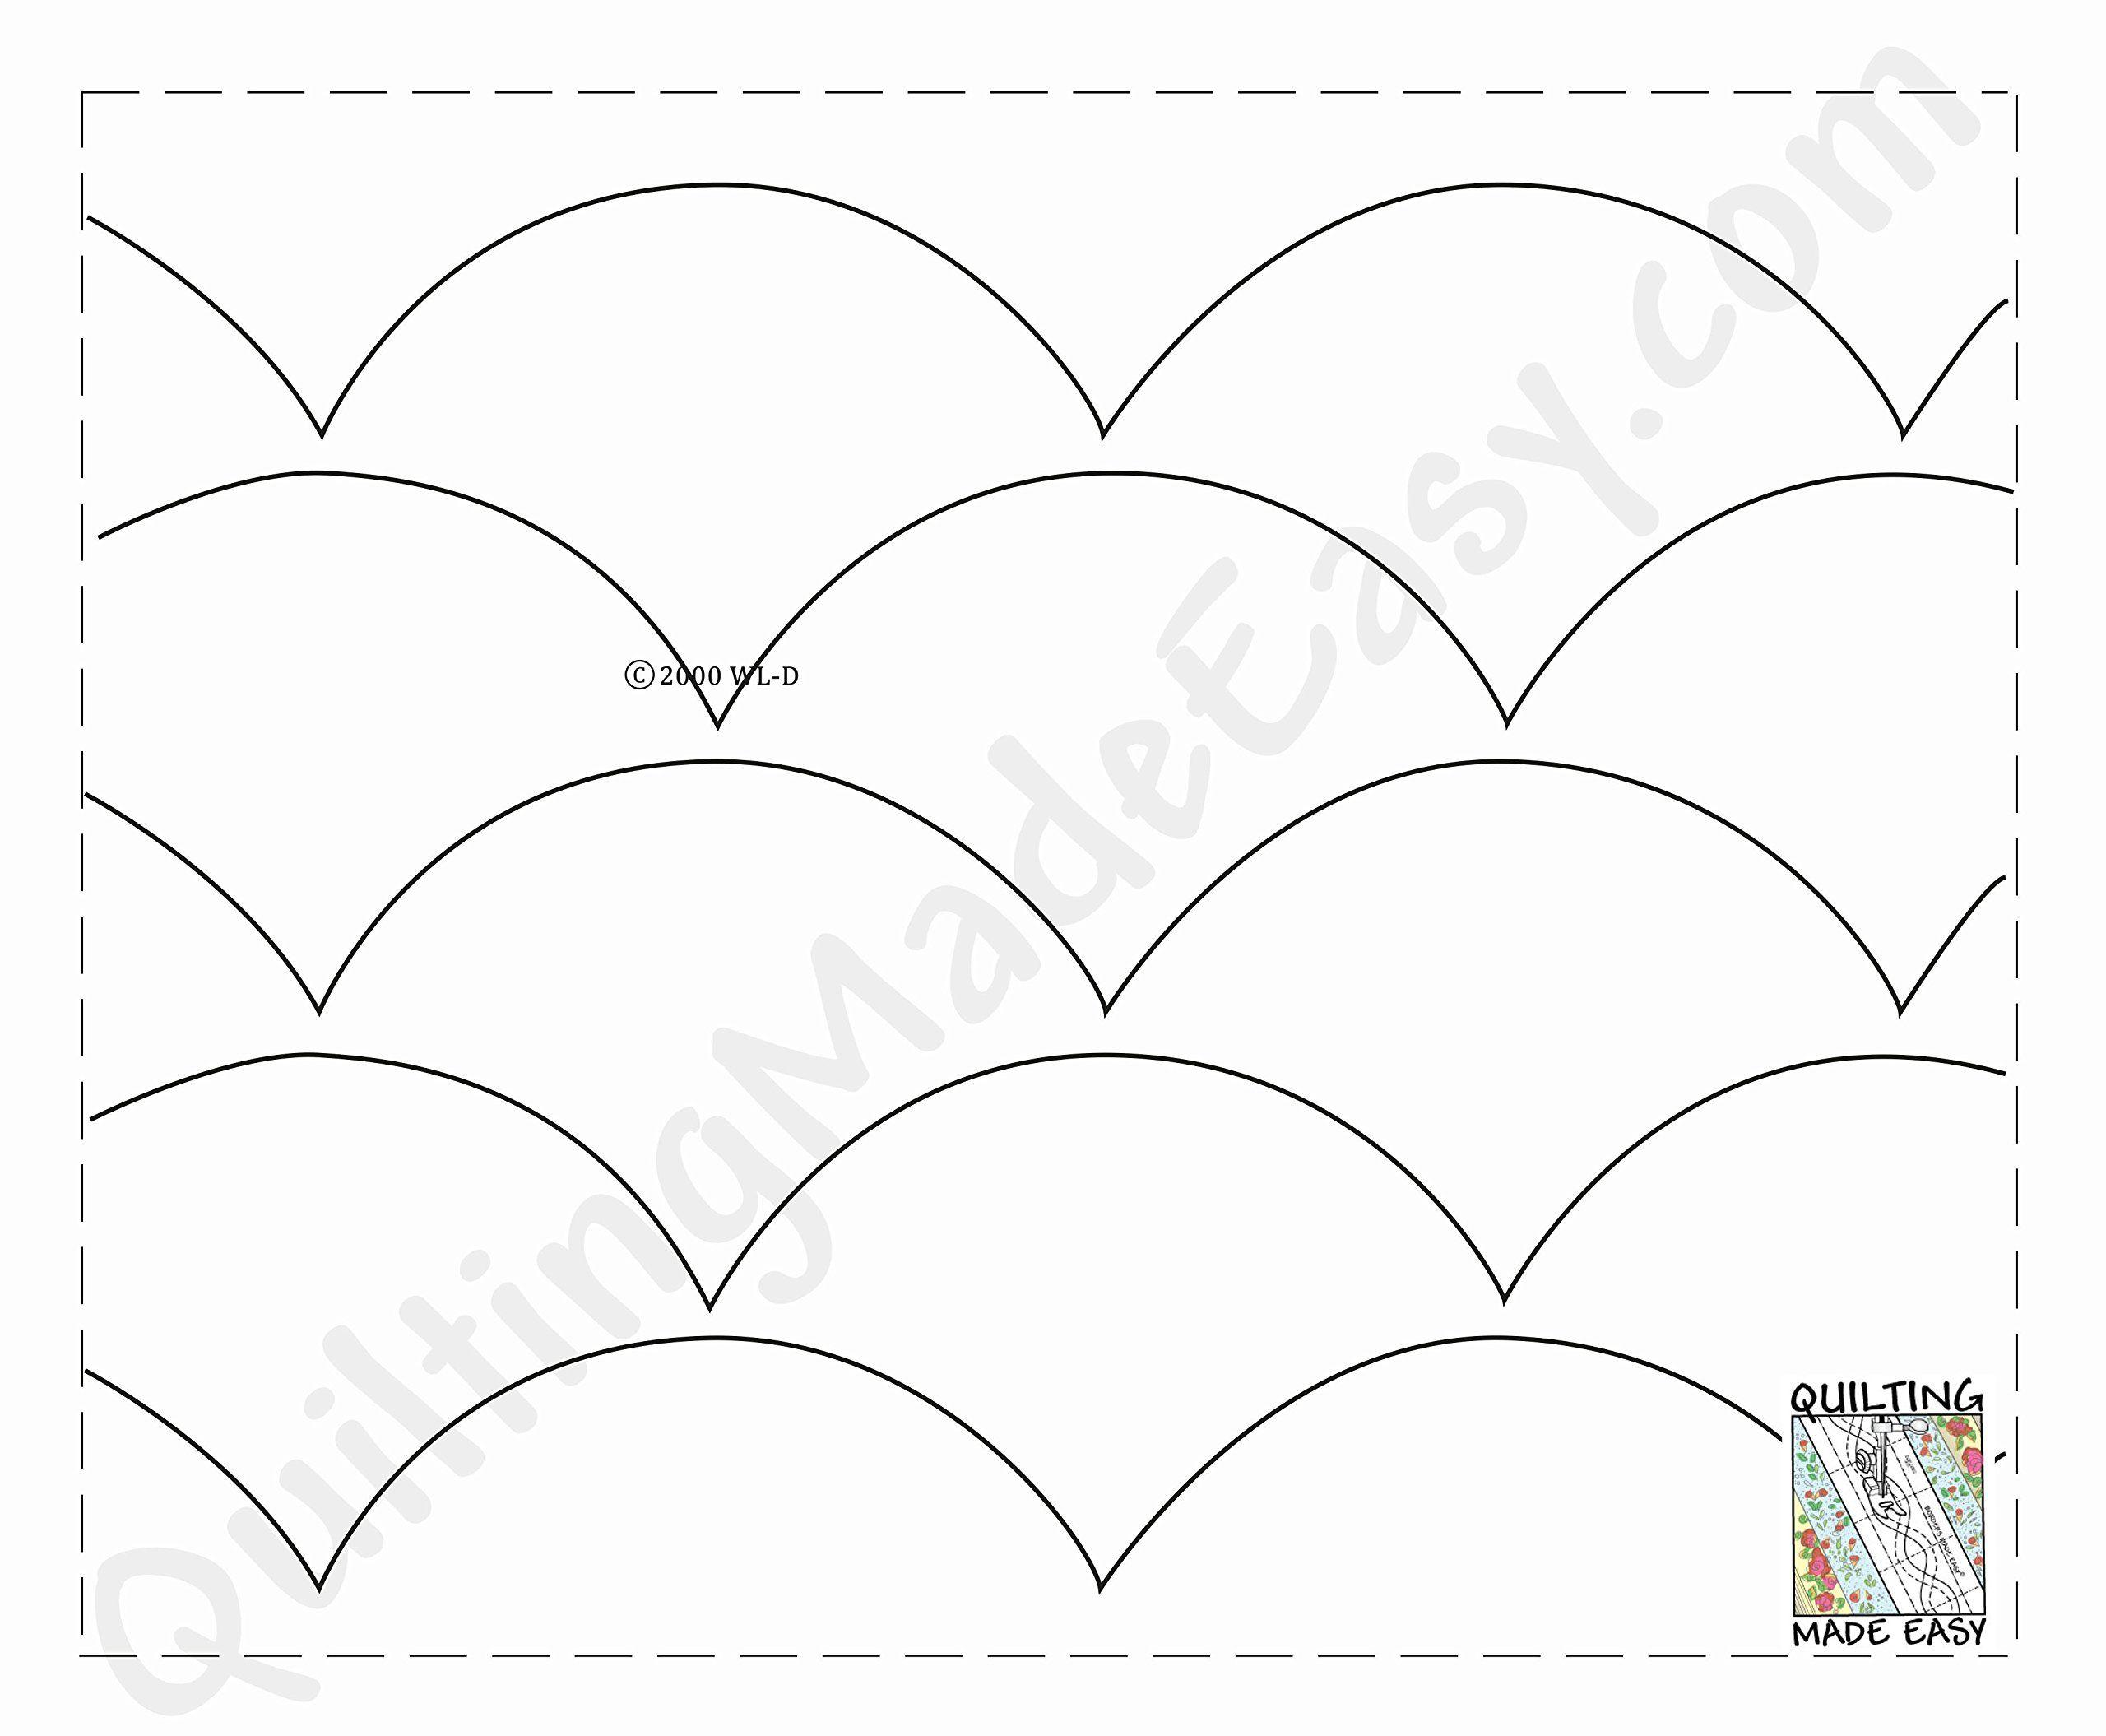 Pantograph Quilt Patterns Quilting Templates Easy Quilting Design Machine Quilting Patterns